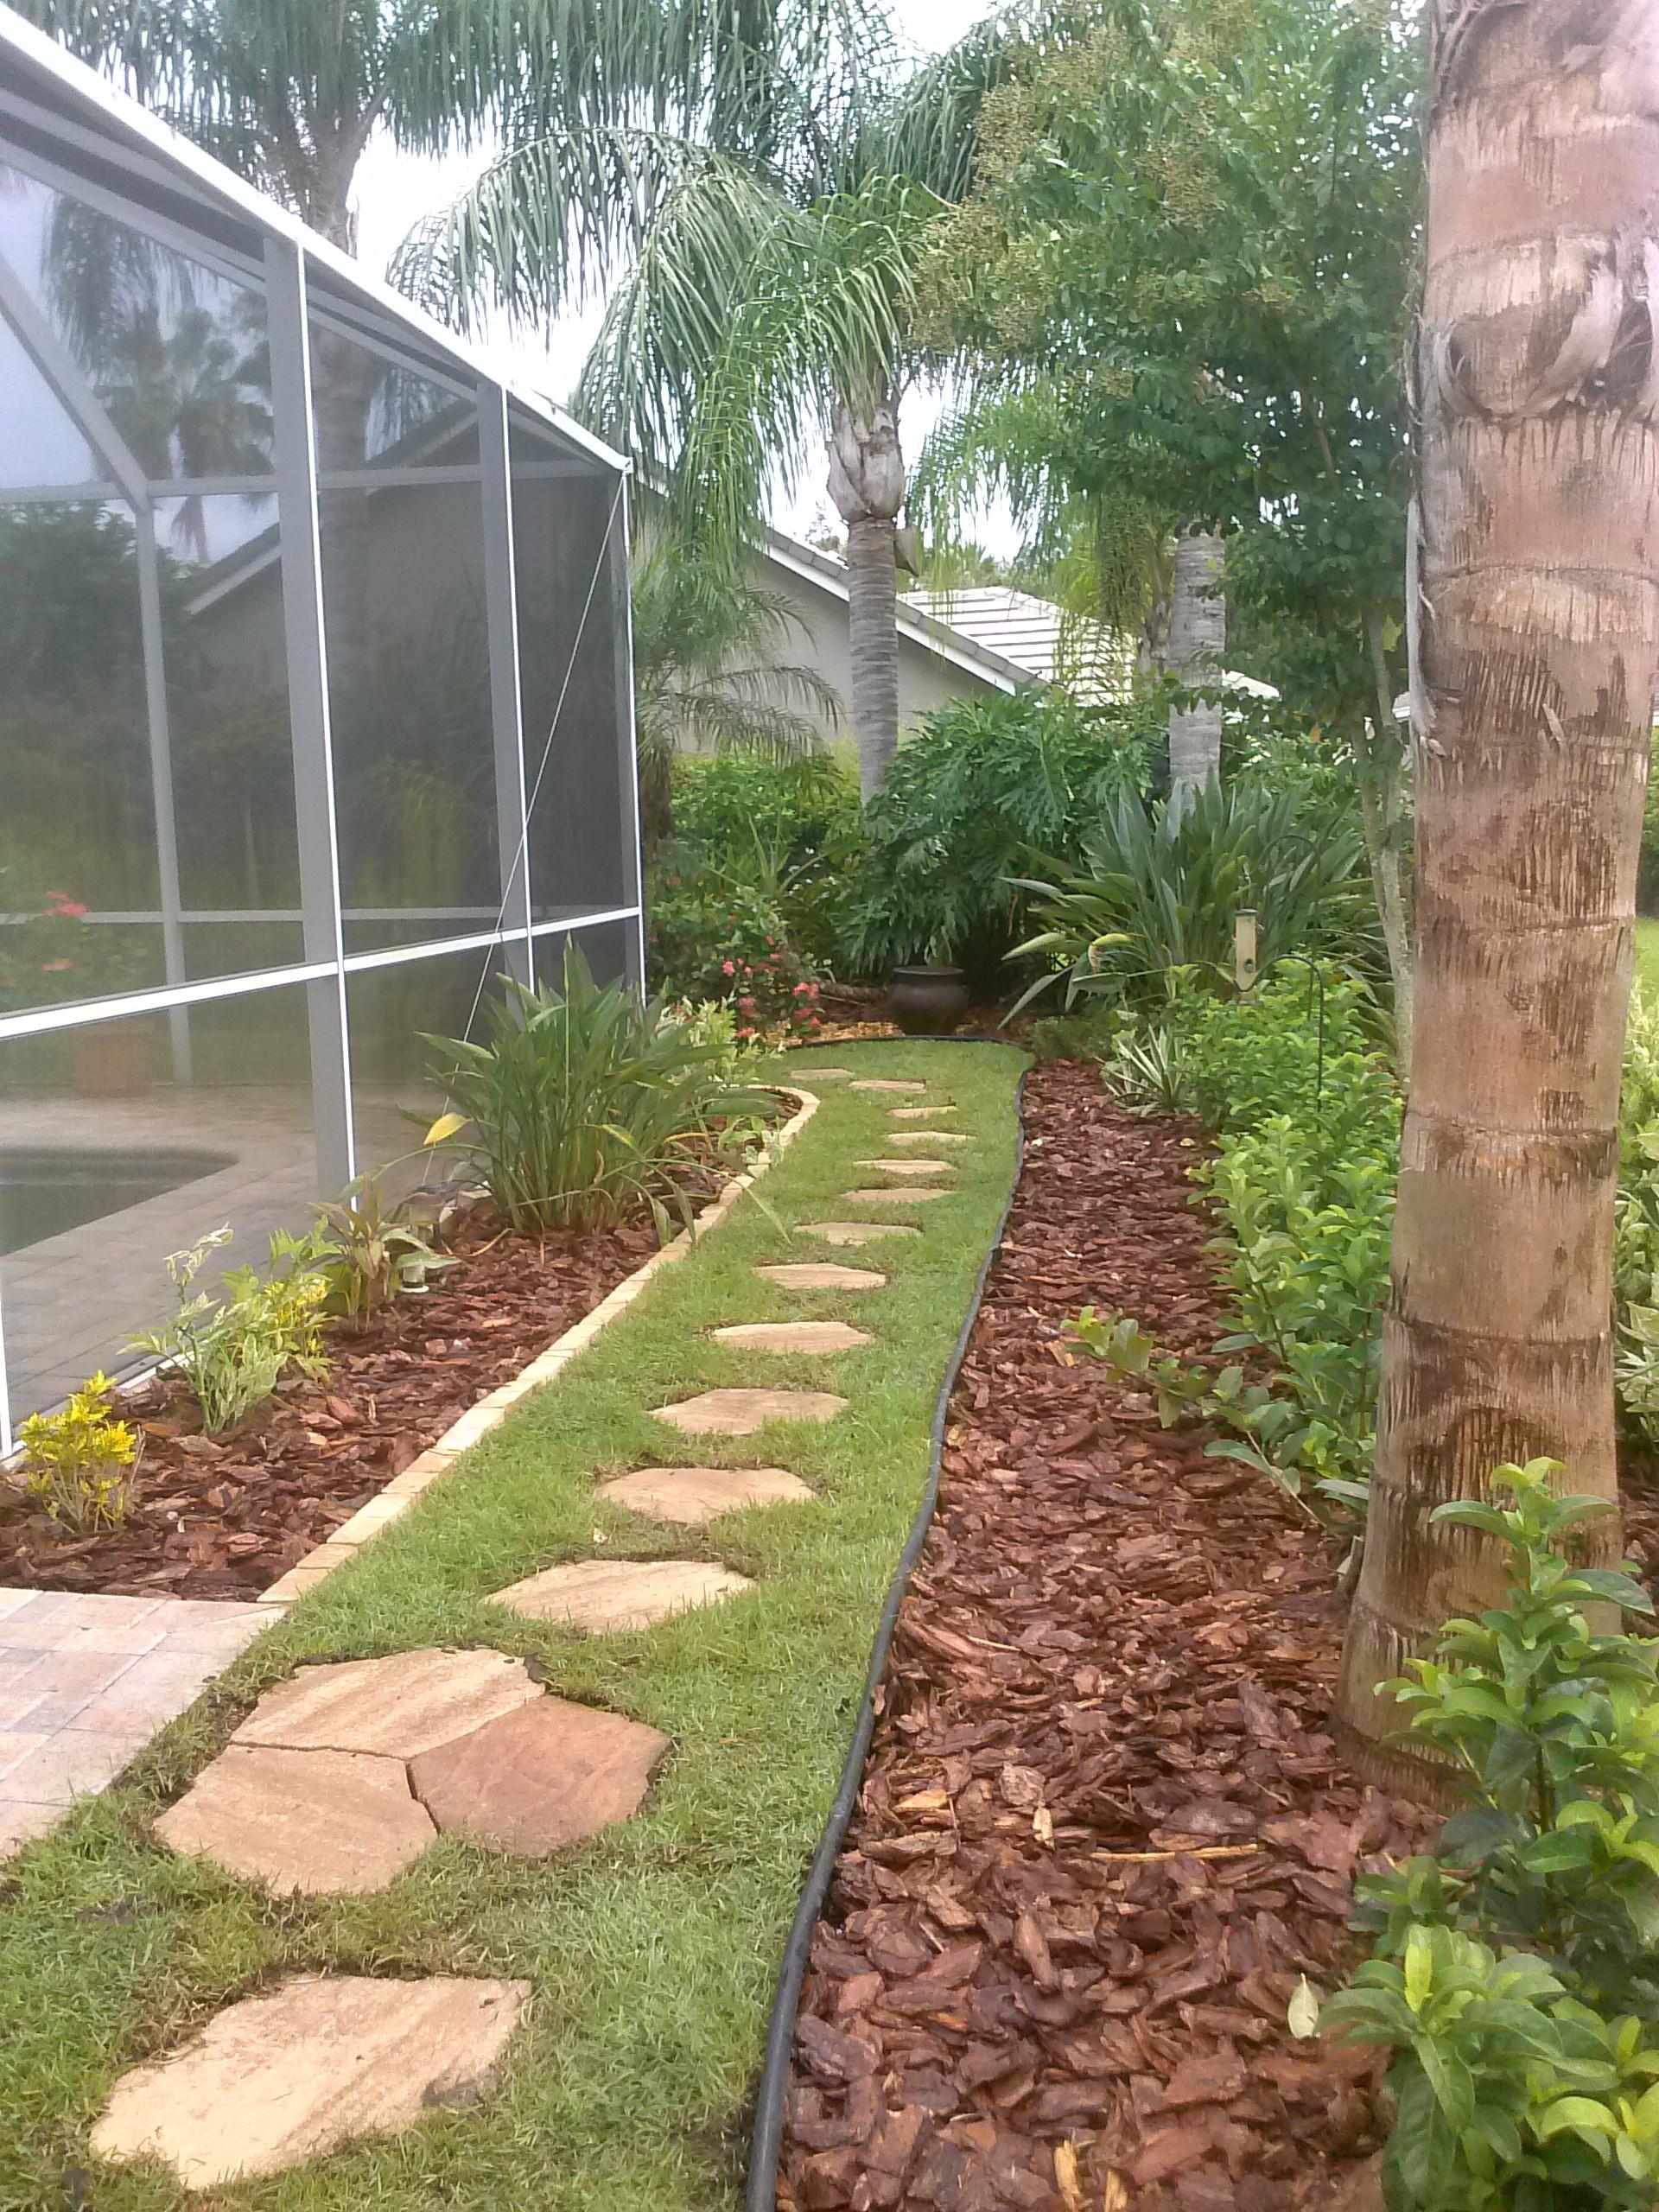 Johns Palms Landscaping image 4